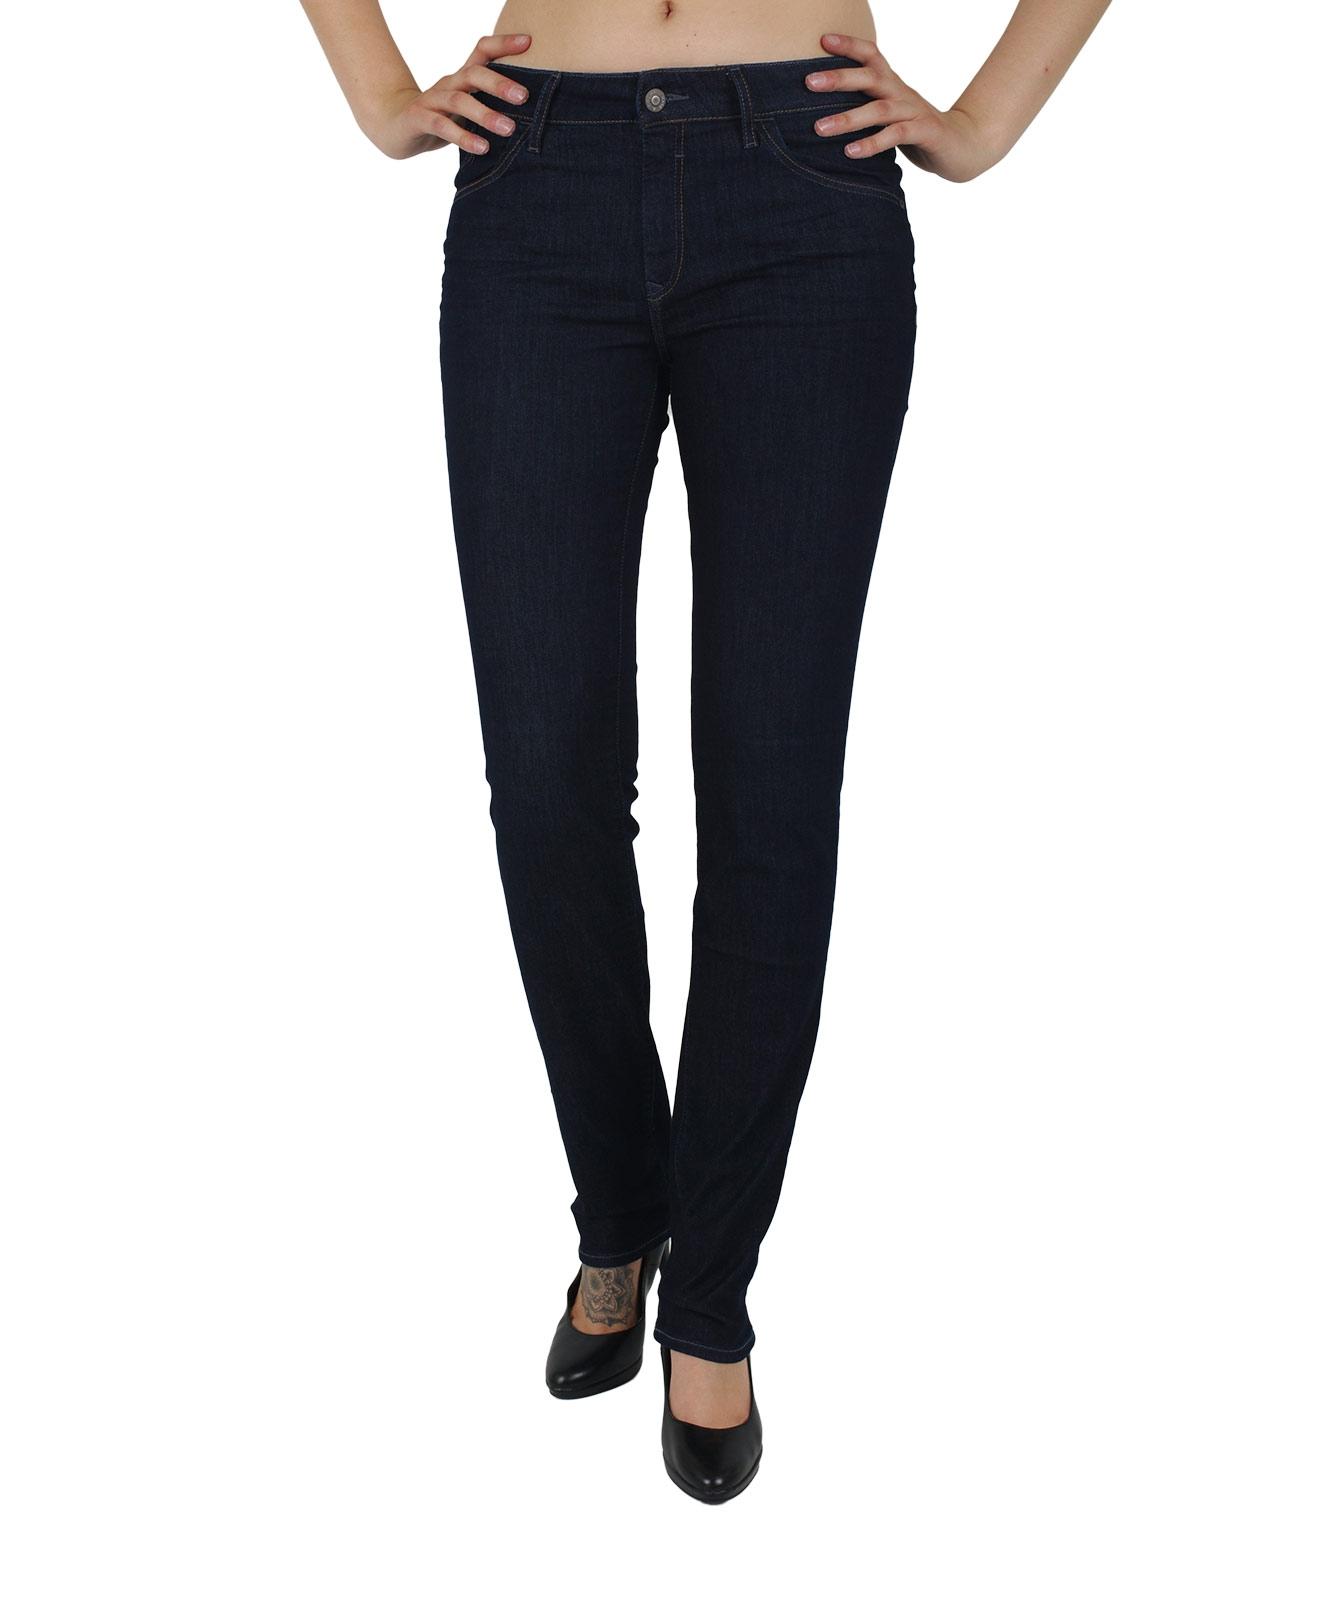 Hosen für Frauen - MAVI KENDRA High Rise Jeans Rinse Milan  - Onlineshop Jeans Meile